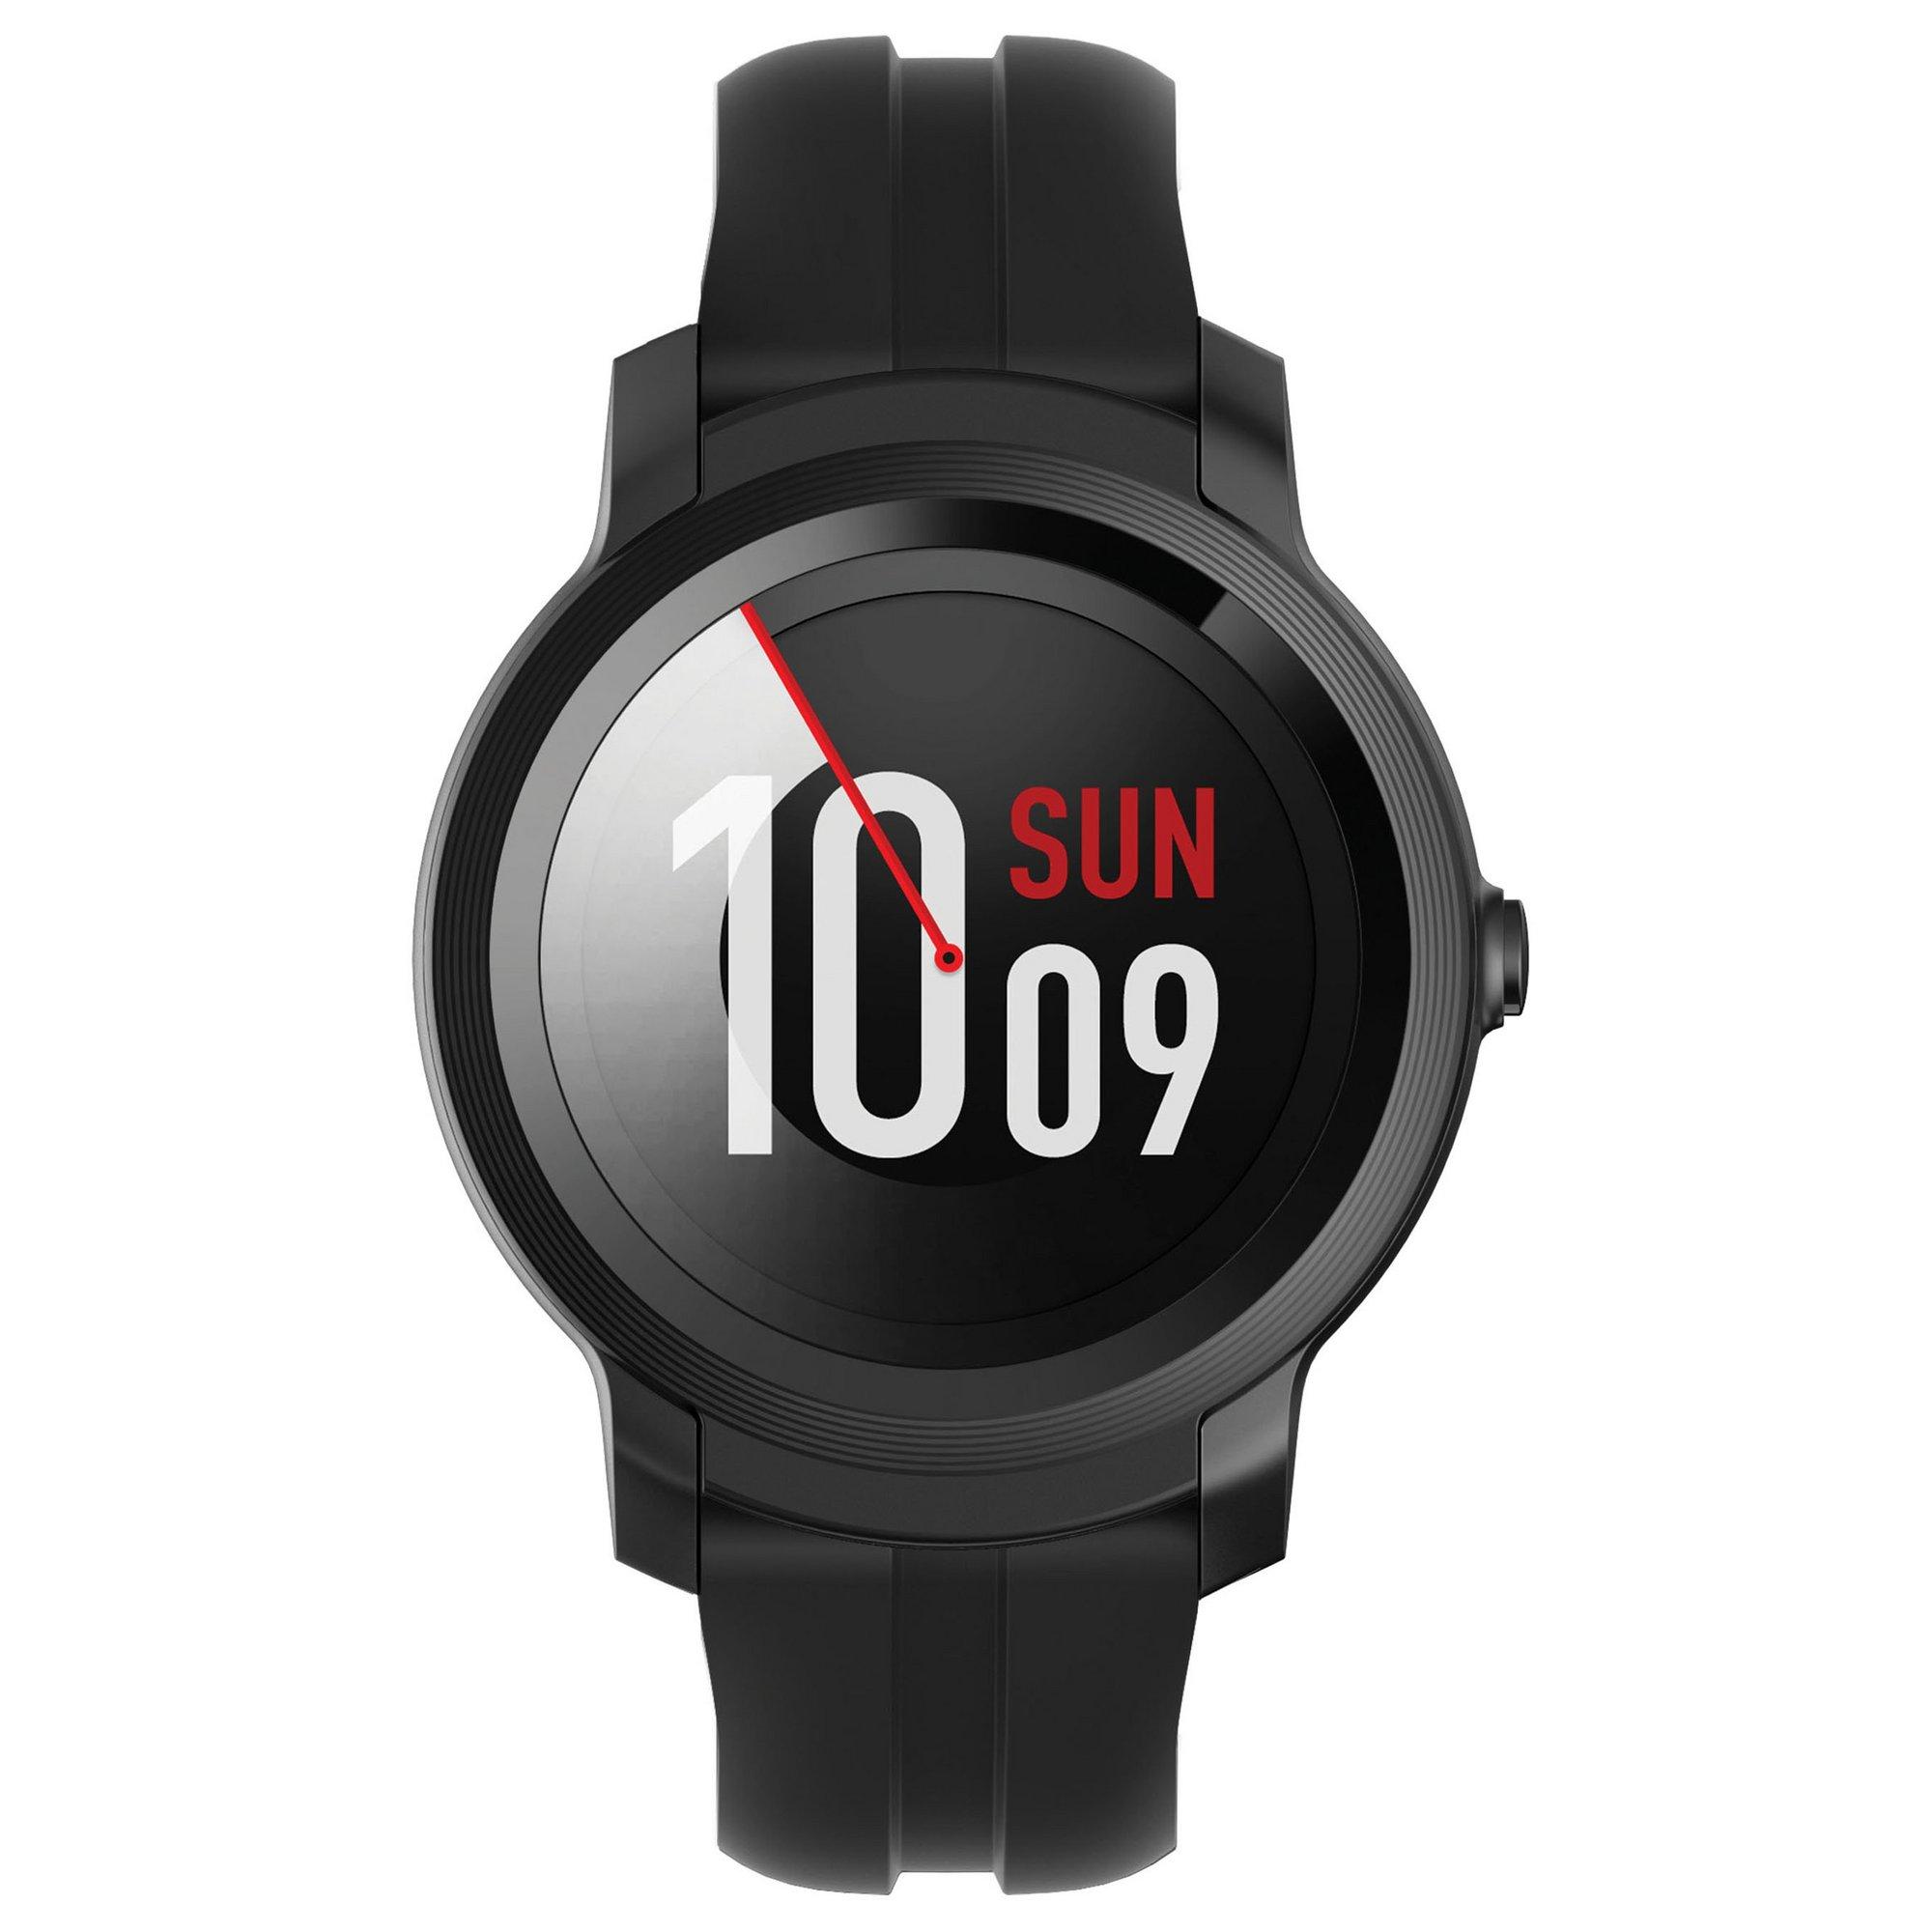 Image of Mobvoi TicWatch E2 Sport Smart Watch